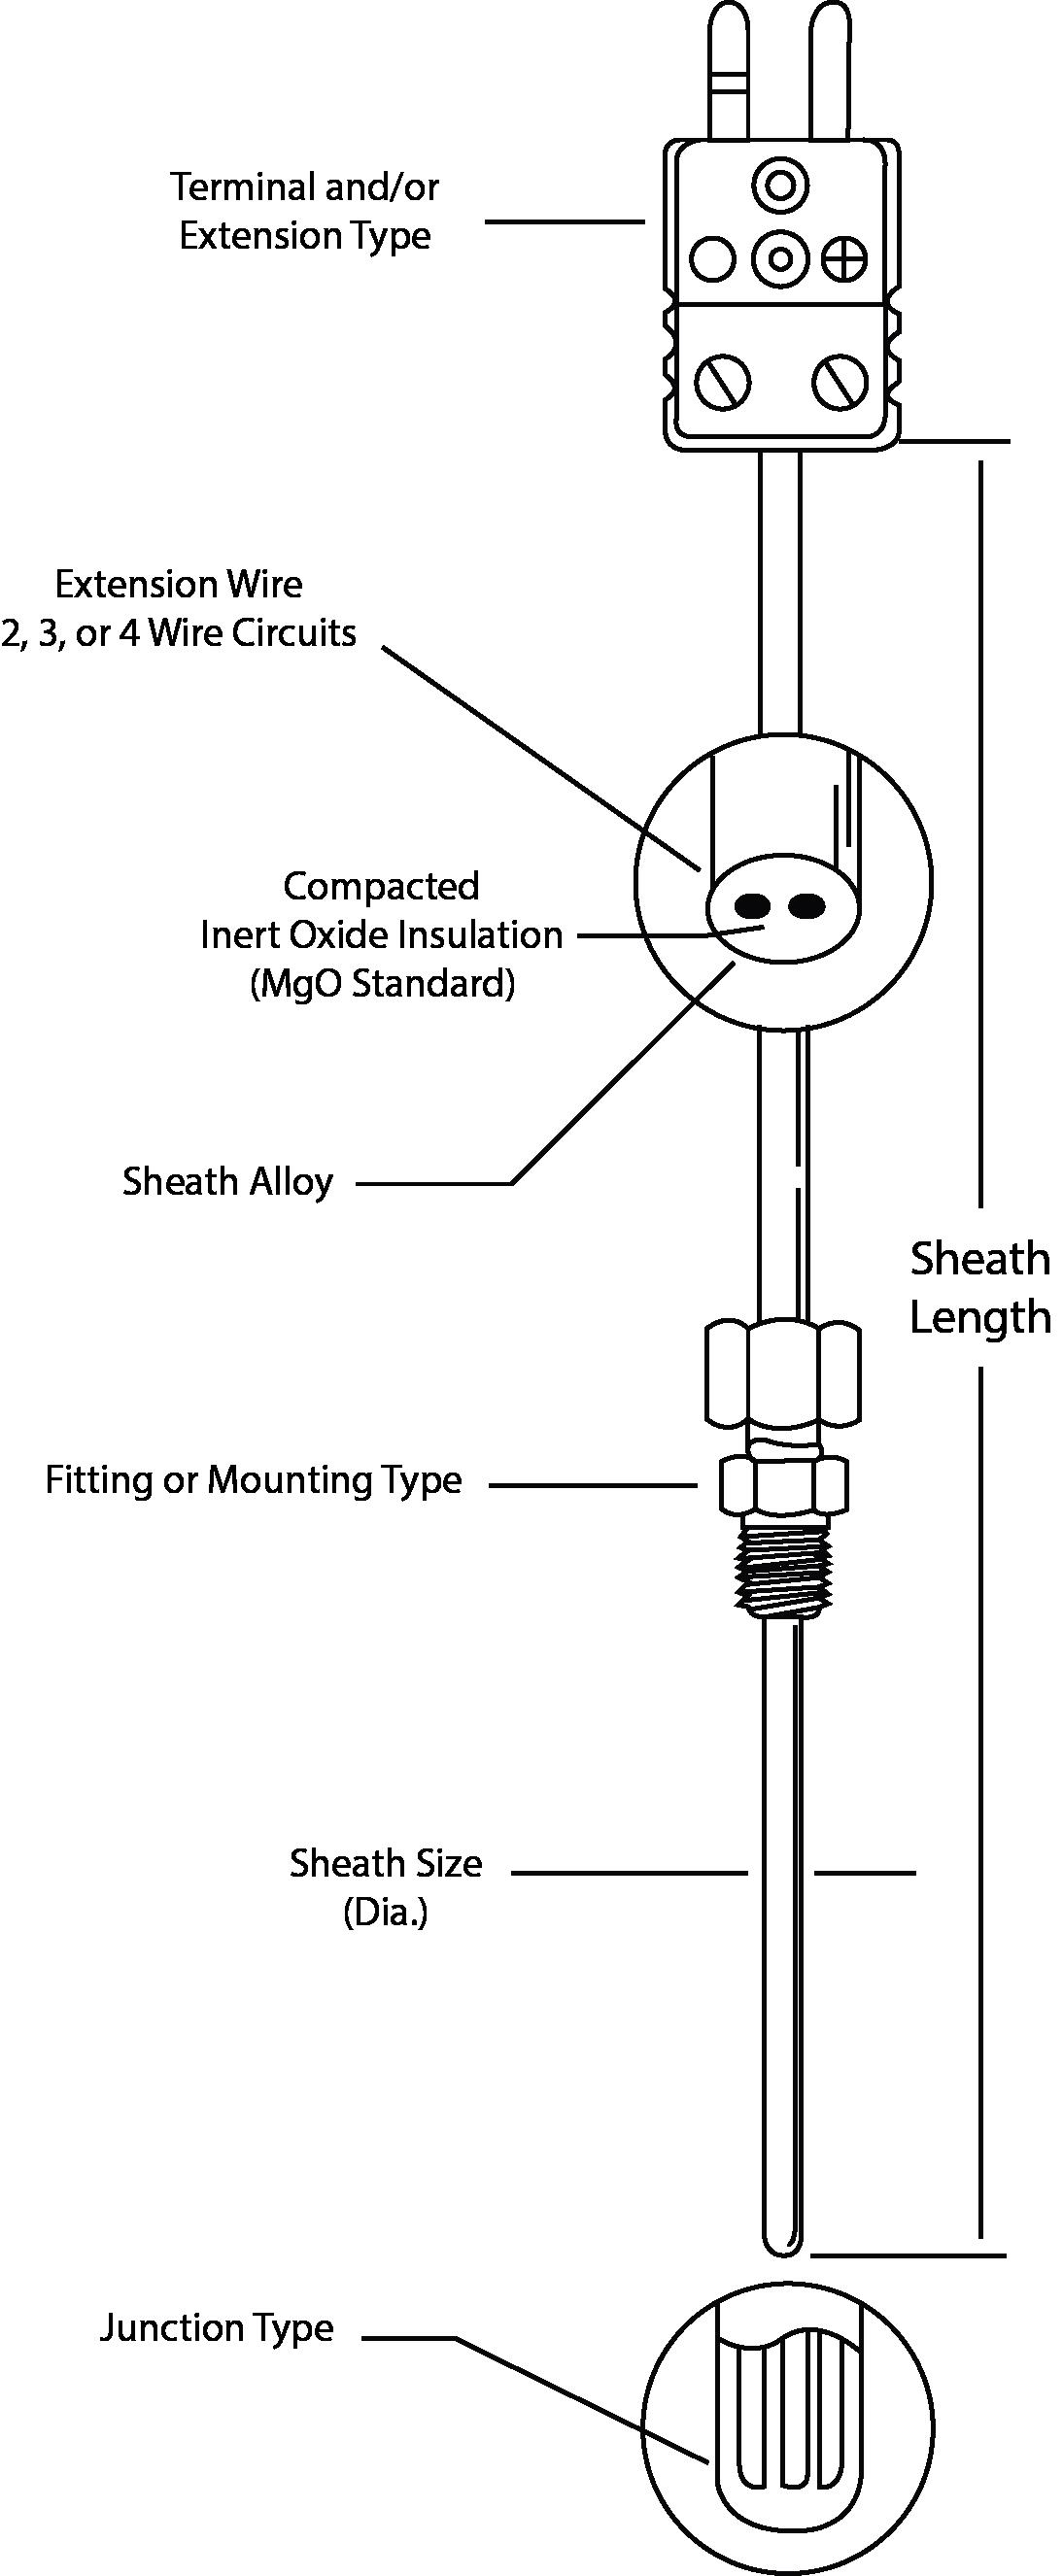 cấu tạo thermocouple